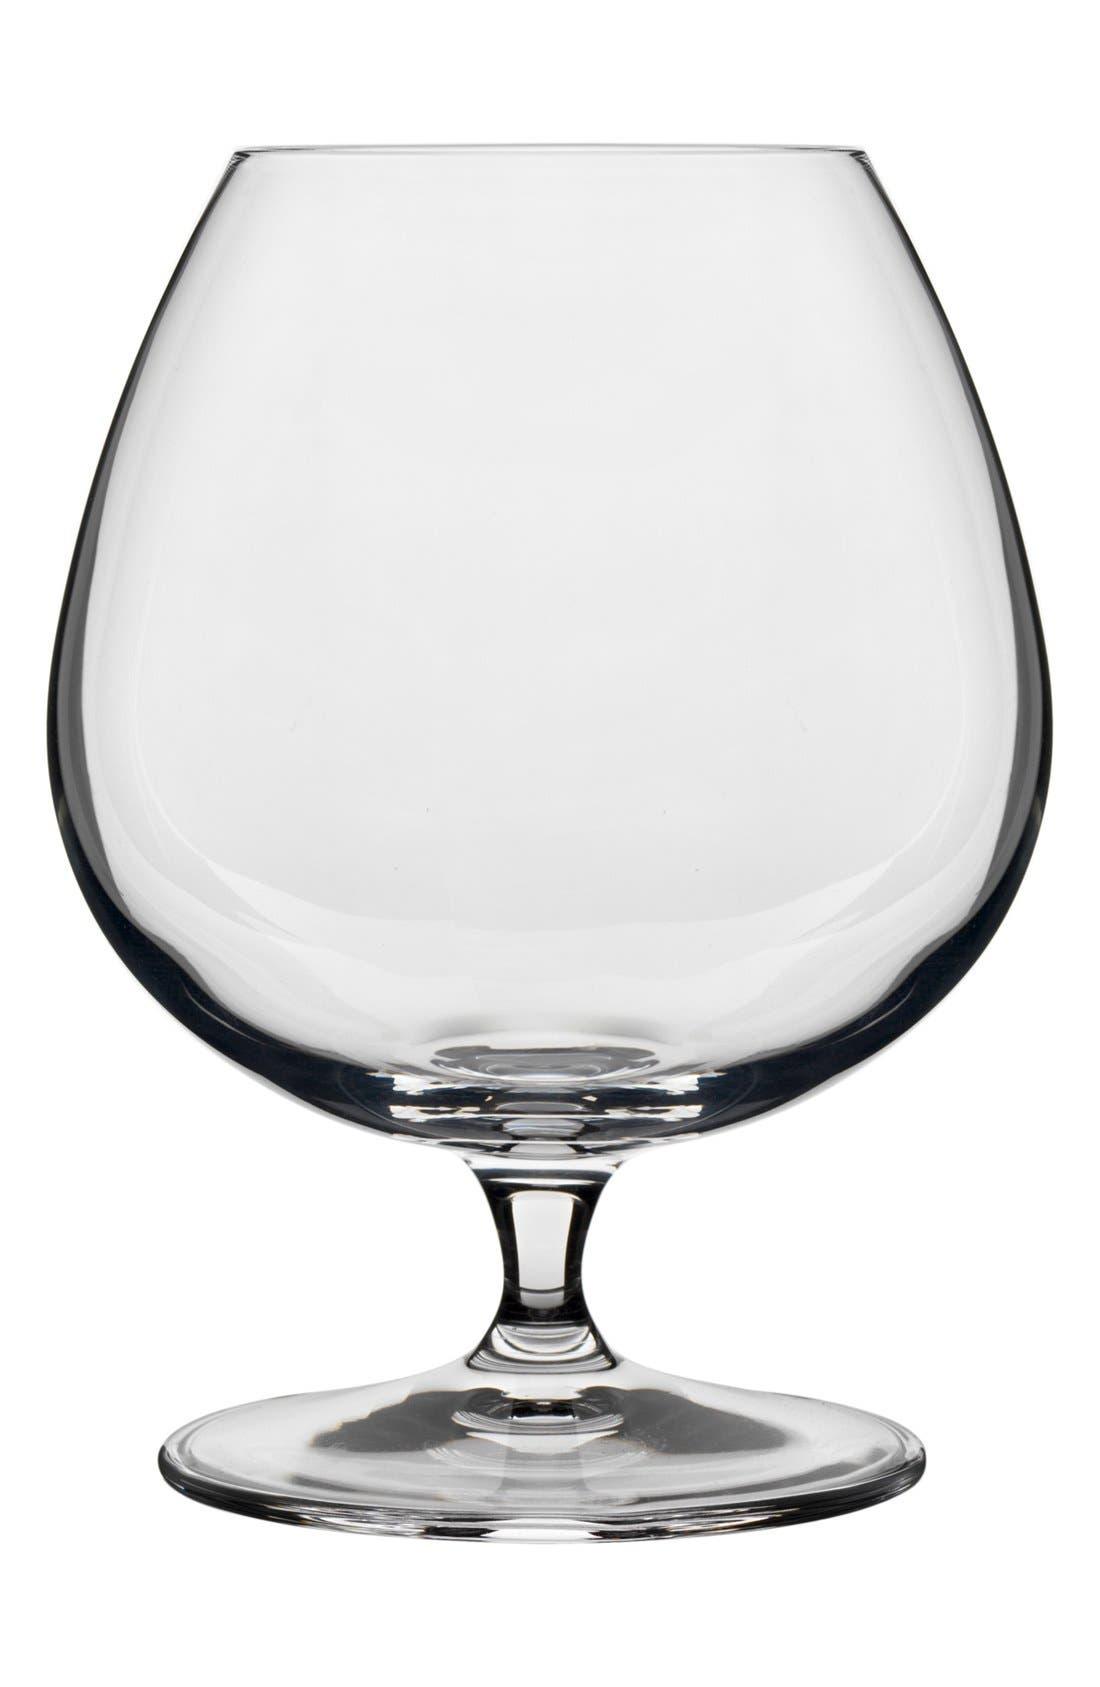 Main Image - Luigi Bormioli 'Crescendo' Cognac Glasses (Set of 4)